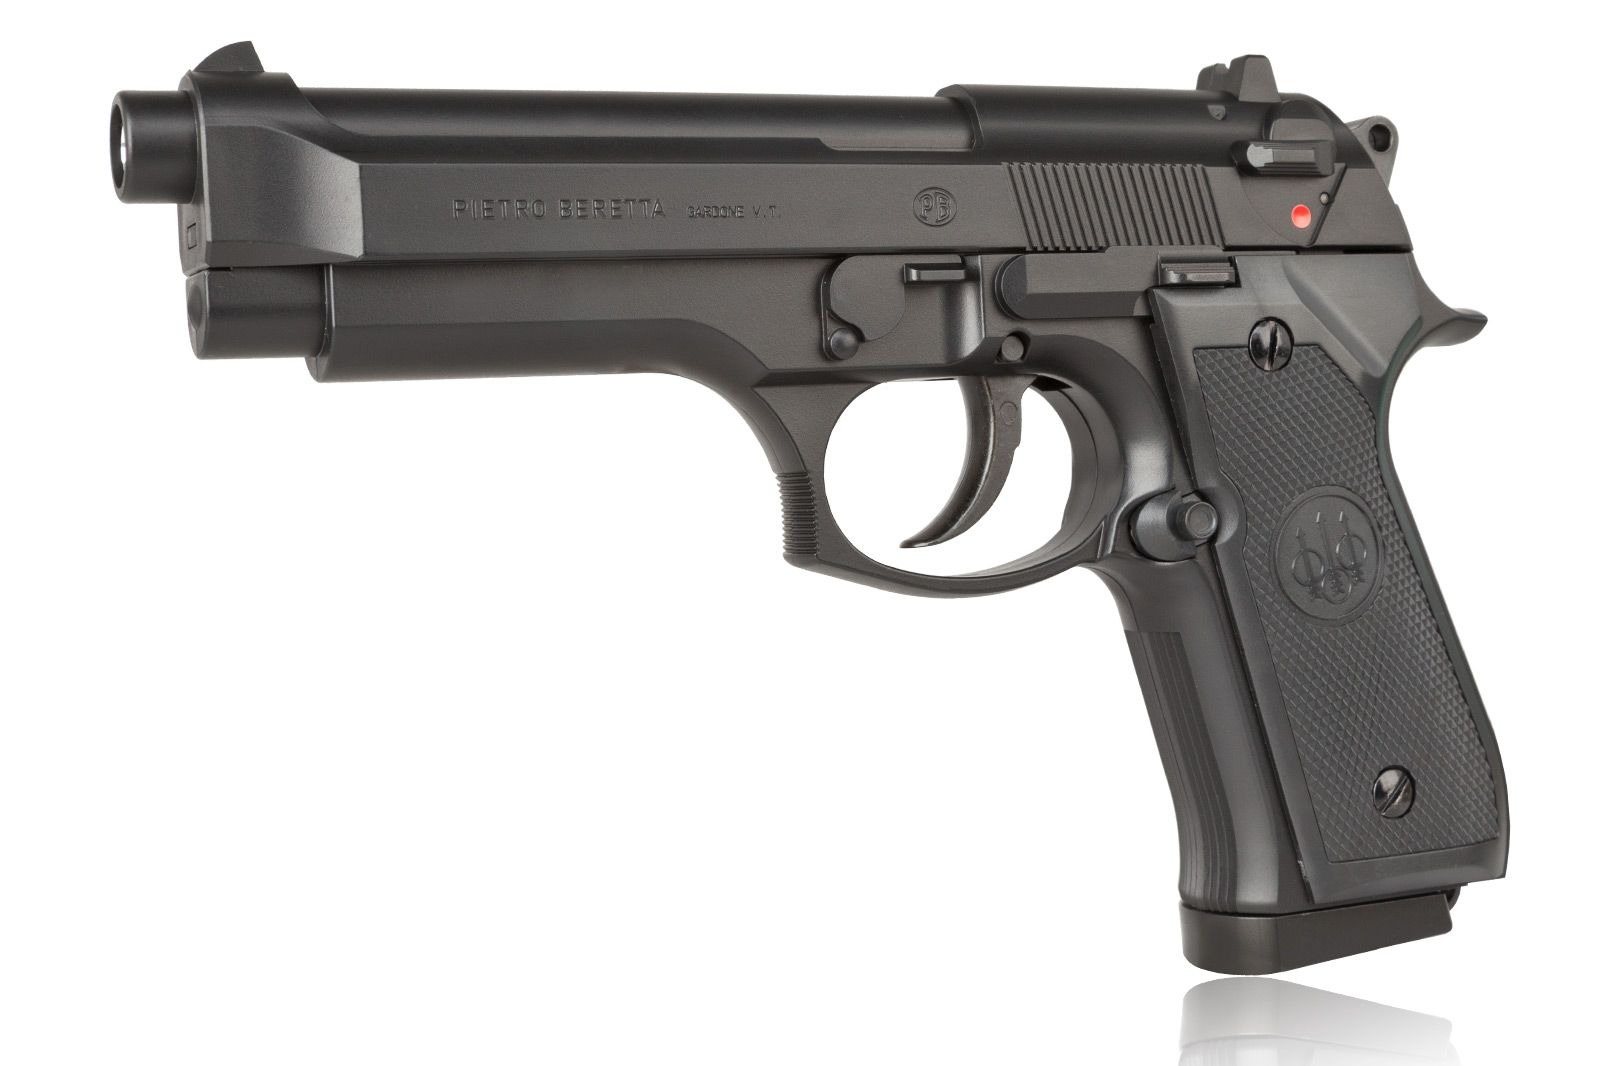 Image of Pistolet asg beretta 92 fs co2 (2.5994)